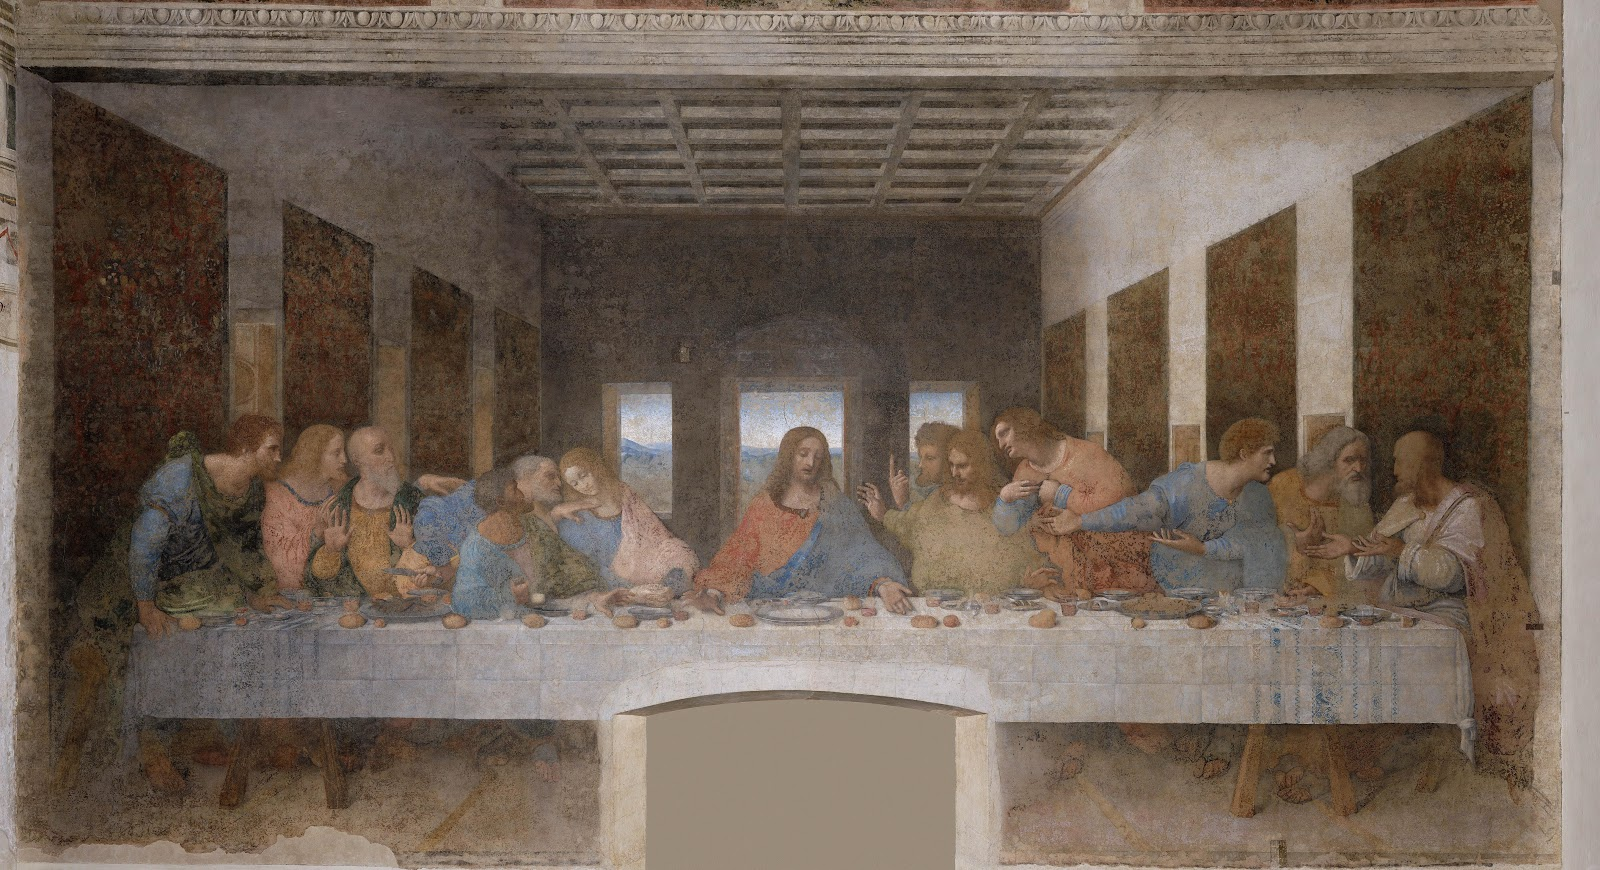 God's Idea of New - Made Sacred